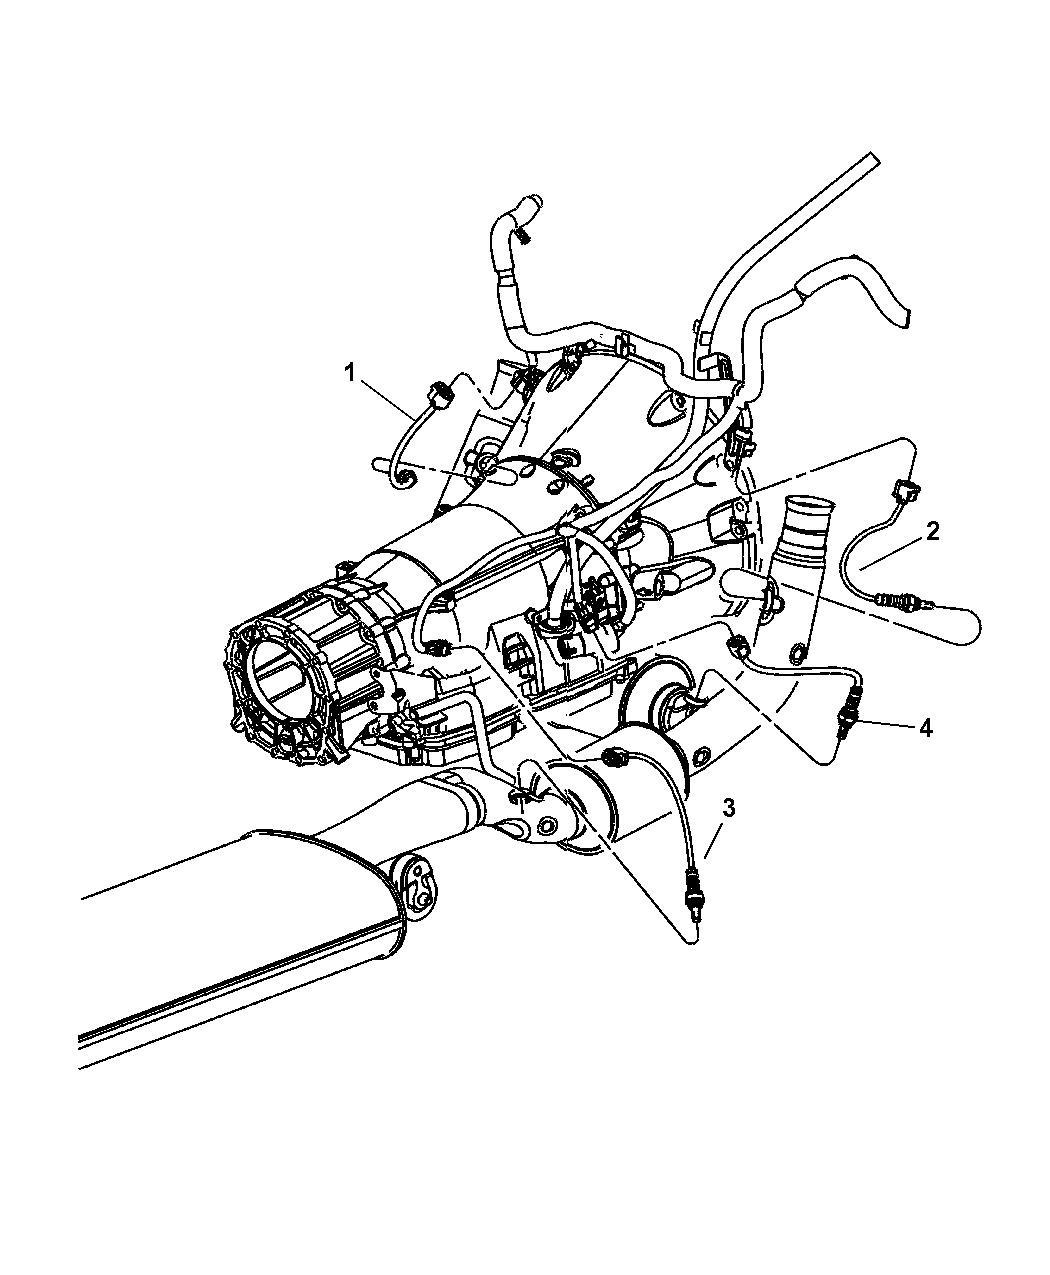 Jeep Commander O2 Sensor Wiring Diagram - Wiring Diagrams List on